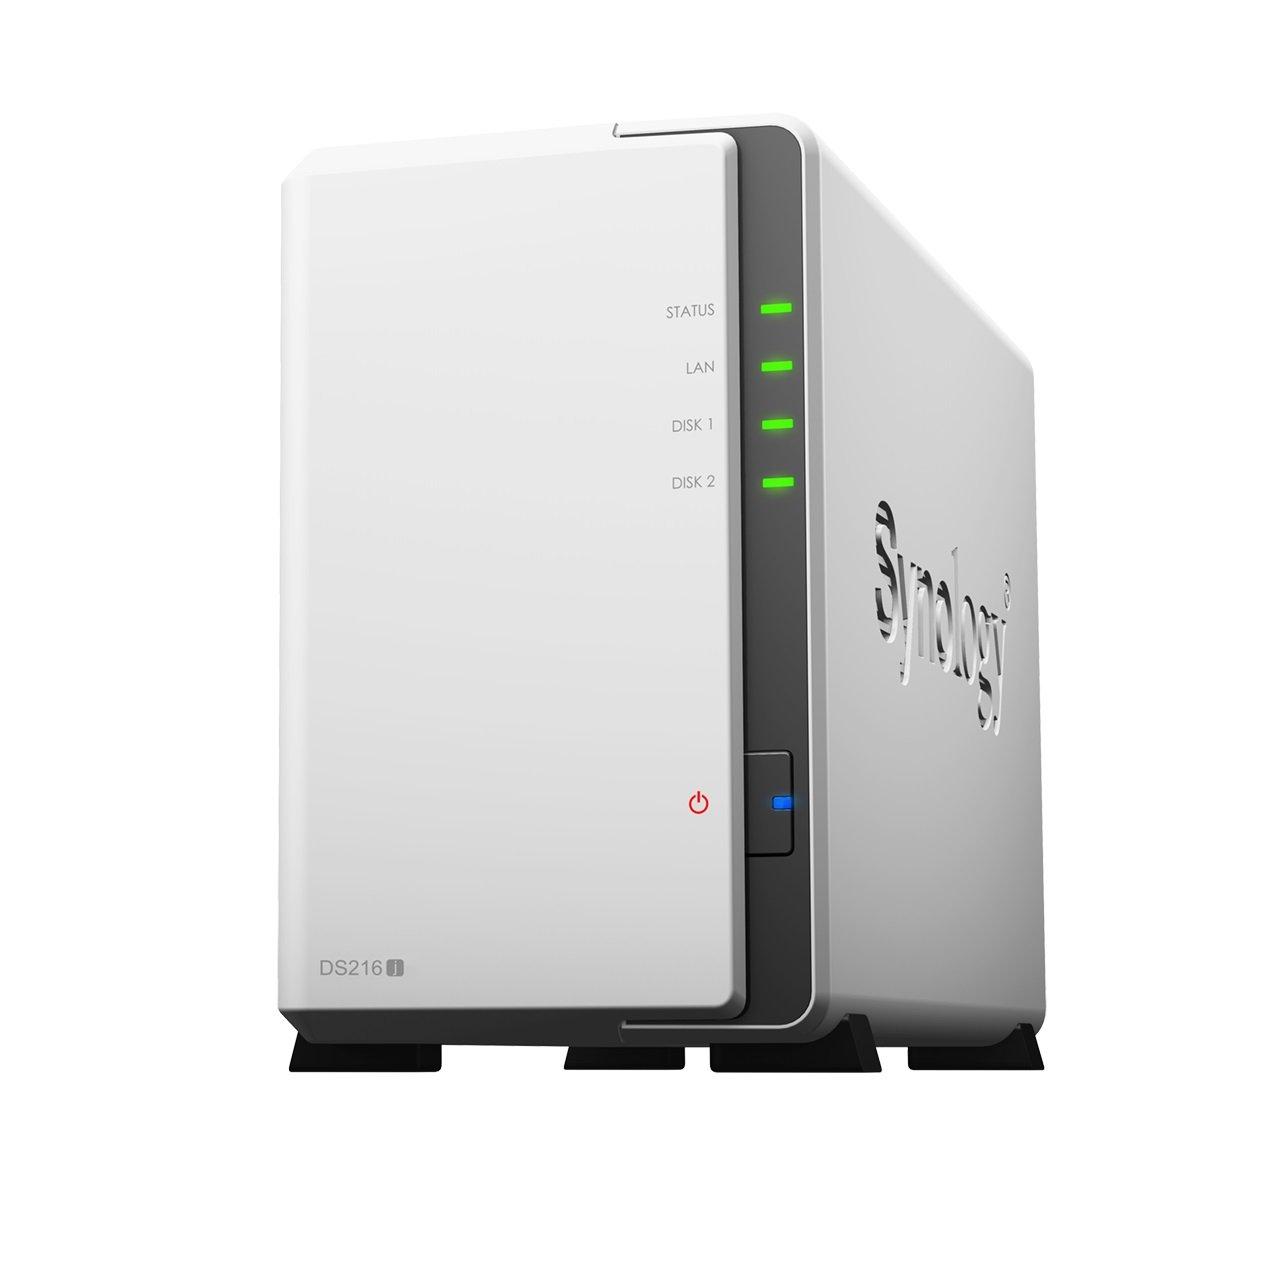 Synology DS216j 4TB 2 x 2To WD RED 2 Bay Bureau Unit/é NAS